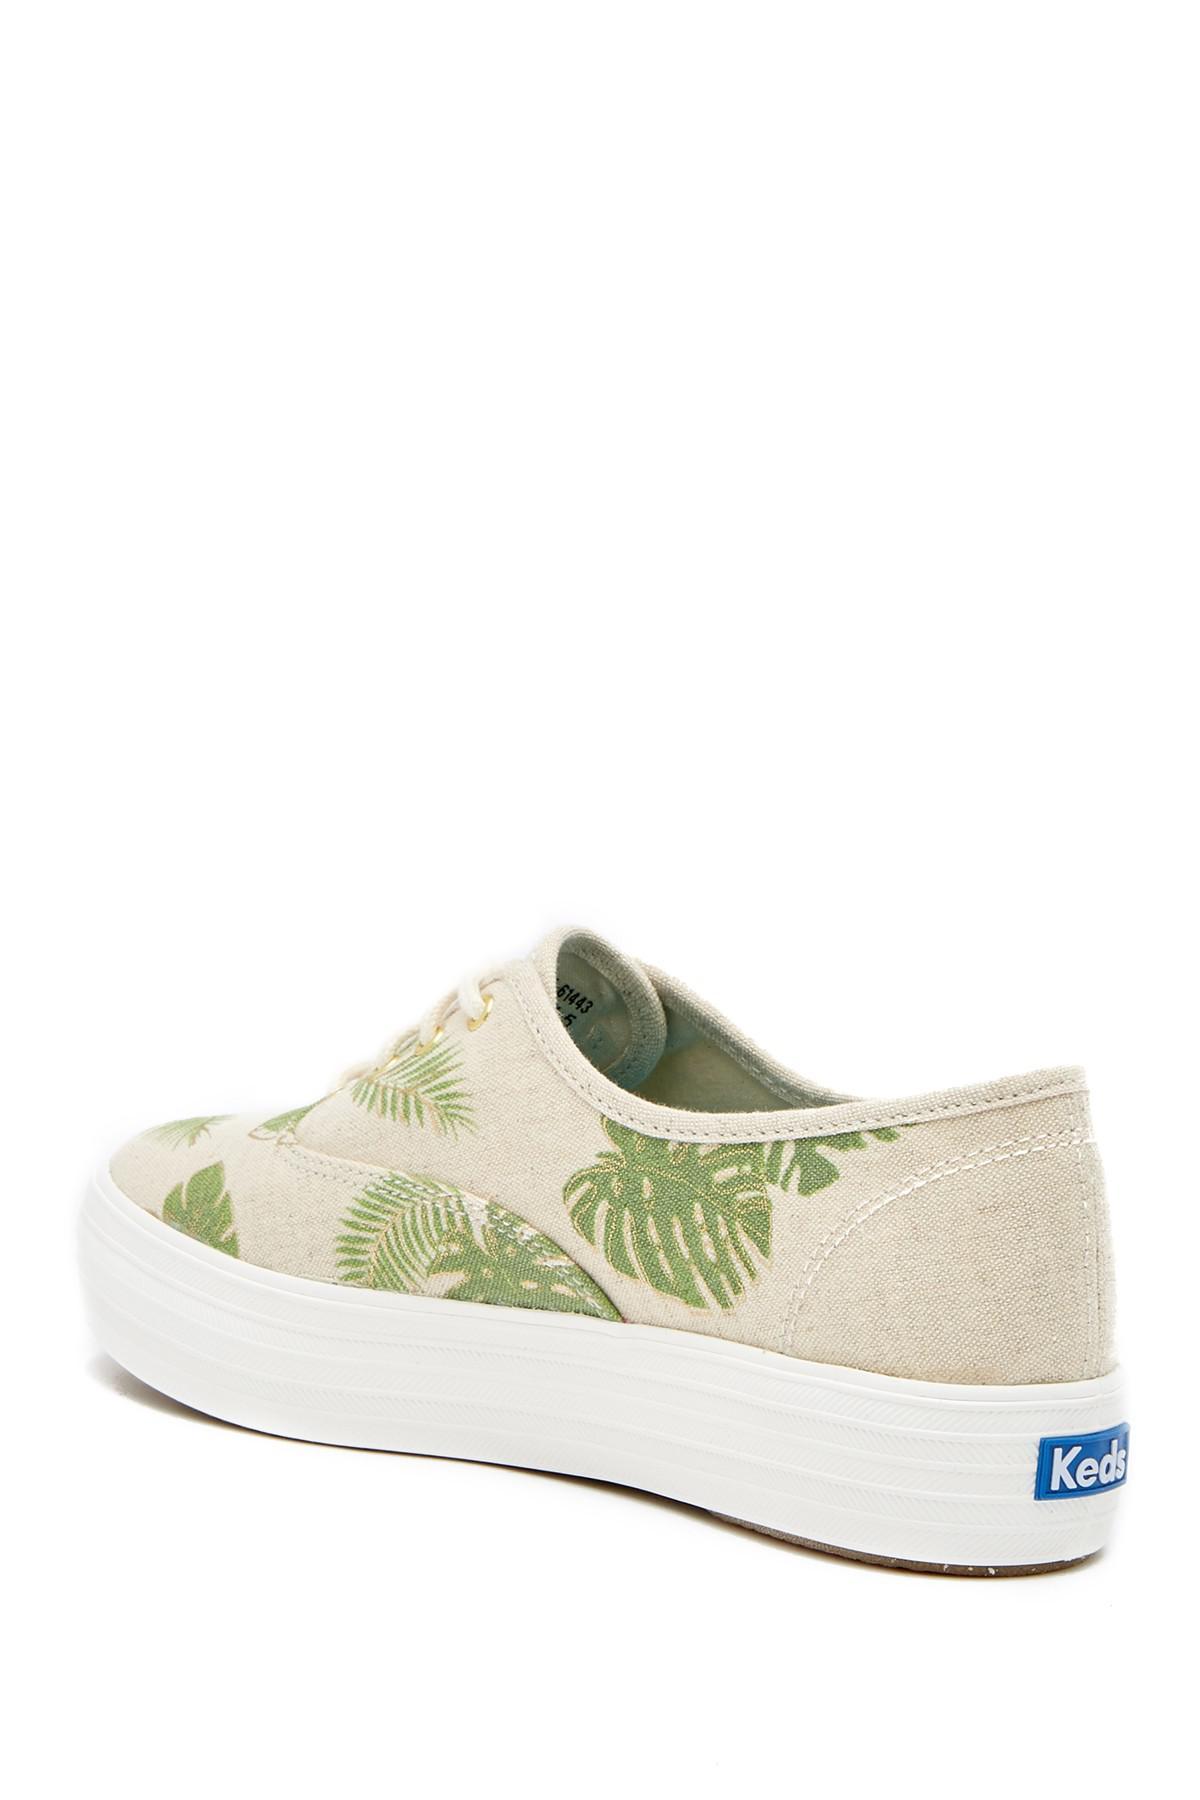 Keds Triple Tropical Platform Sneaker hwDdlyK